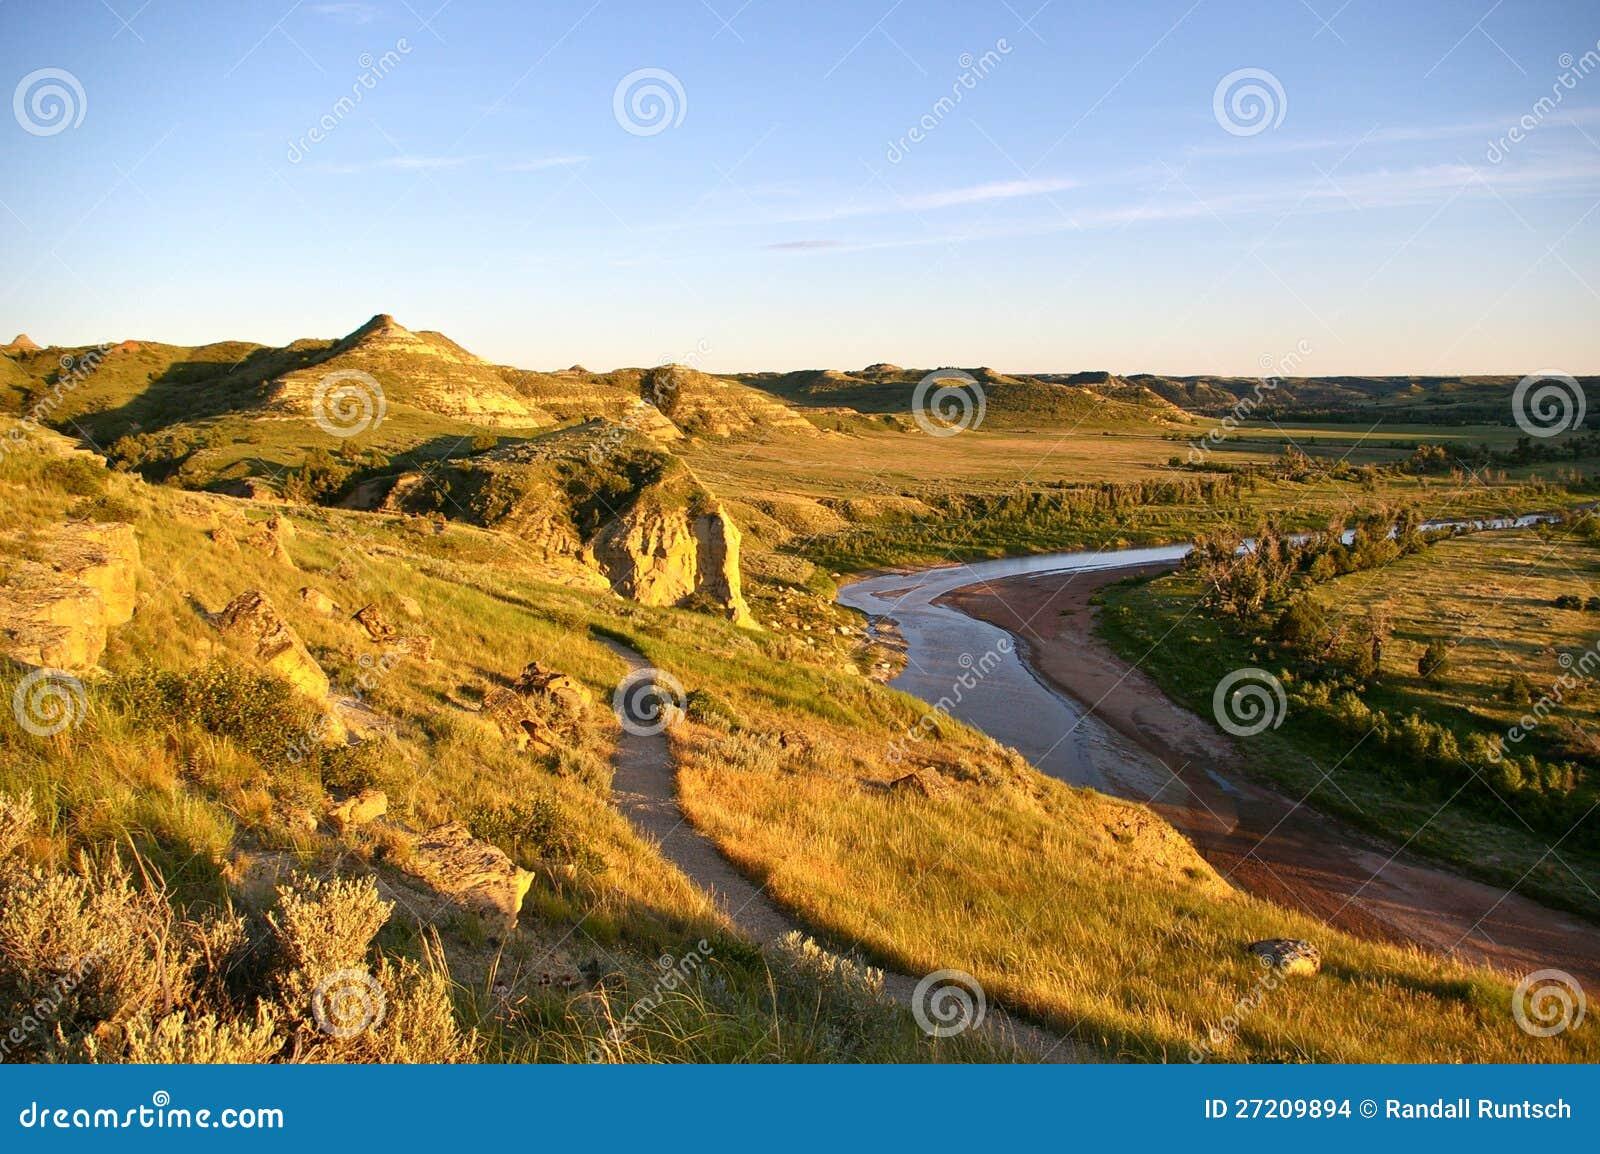 The Badlands of North Dakota